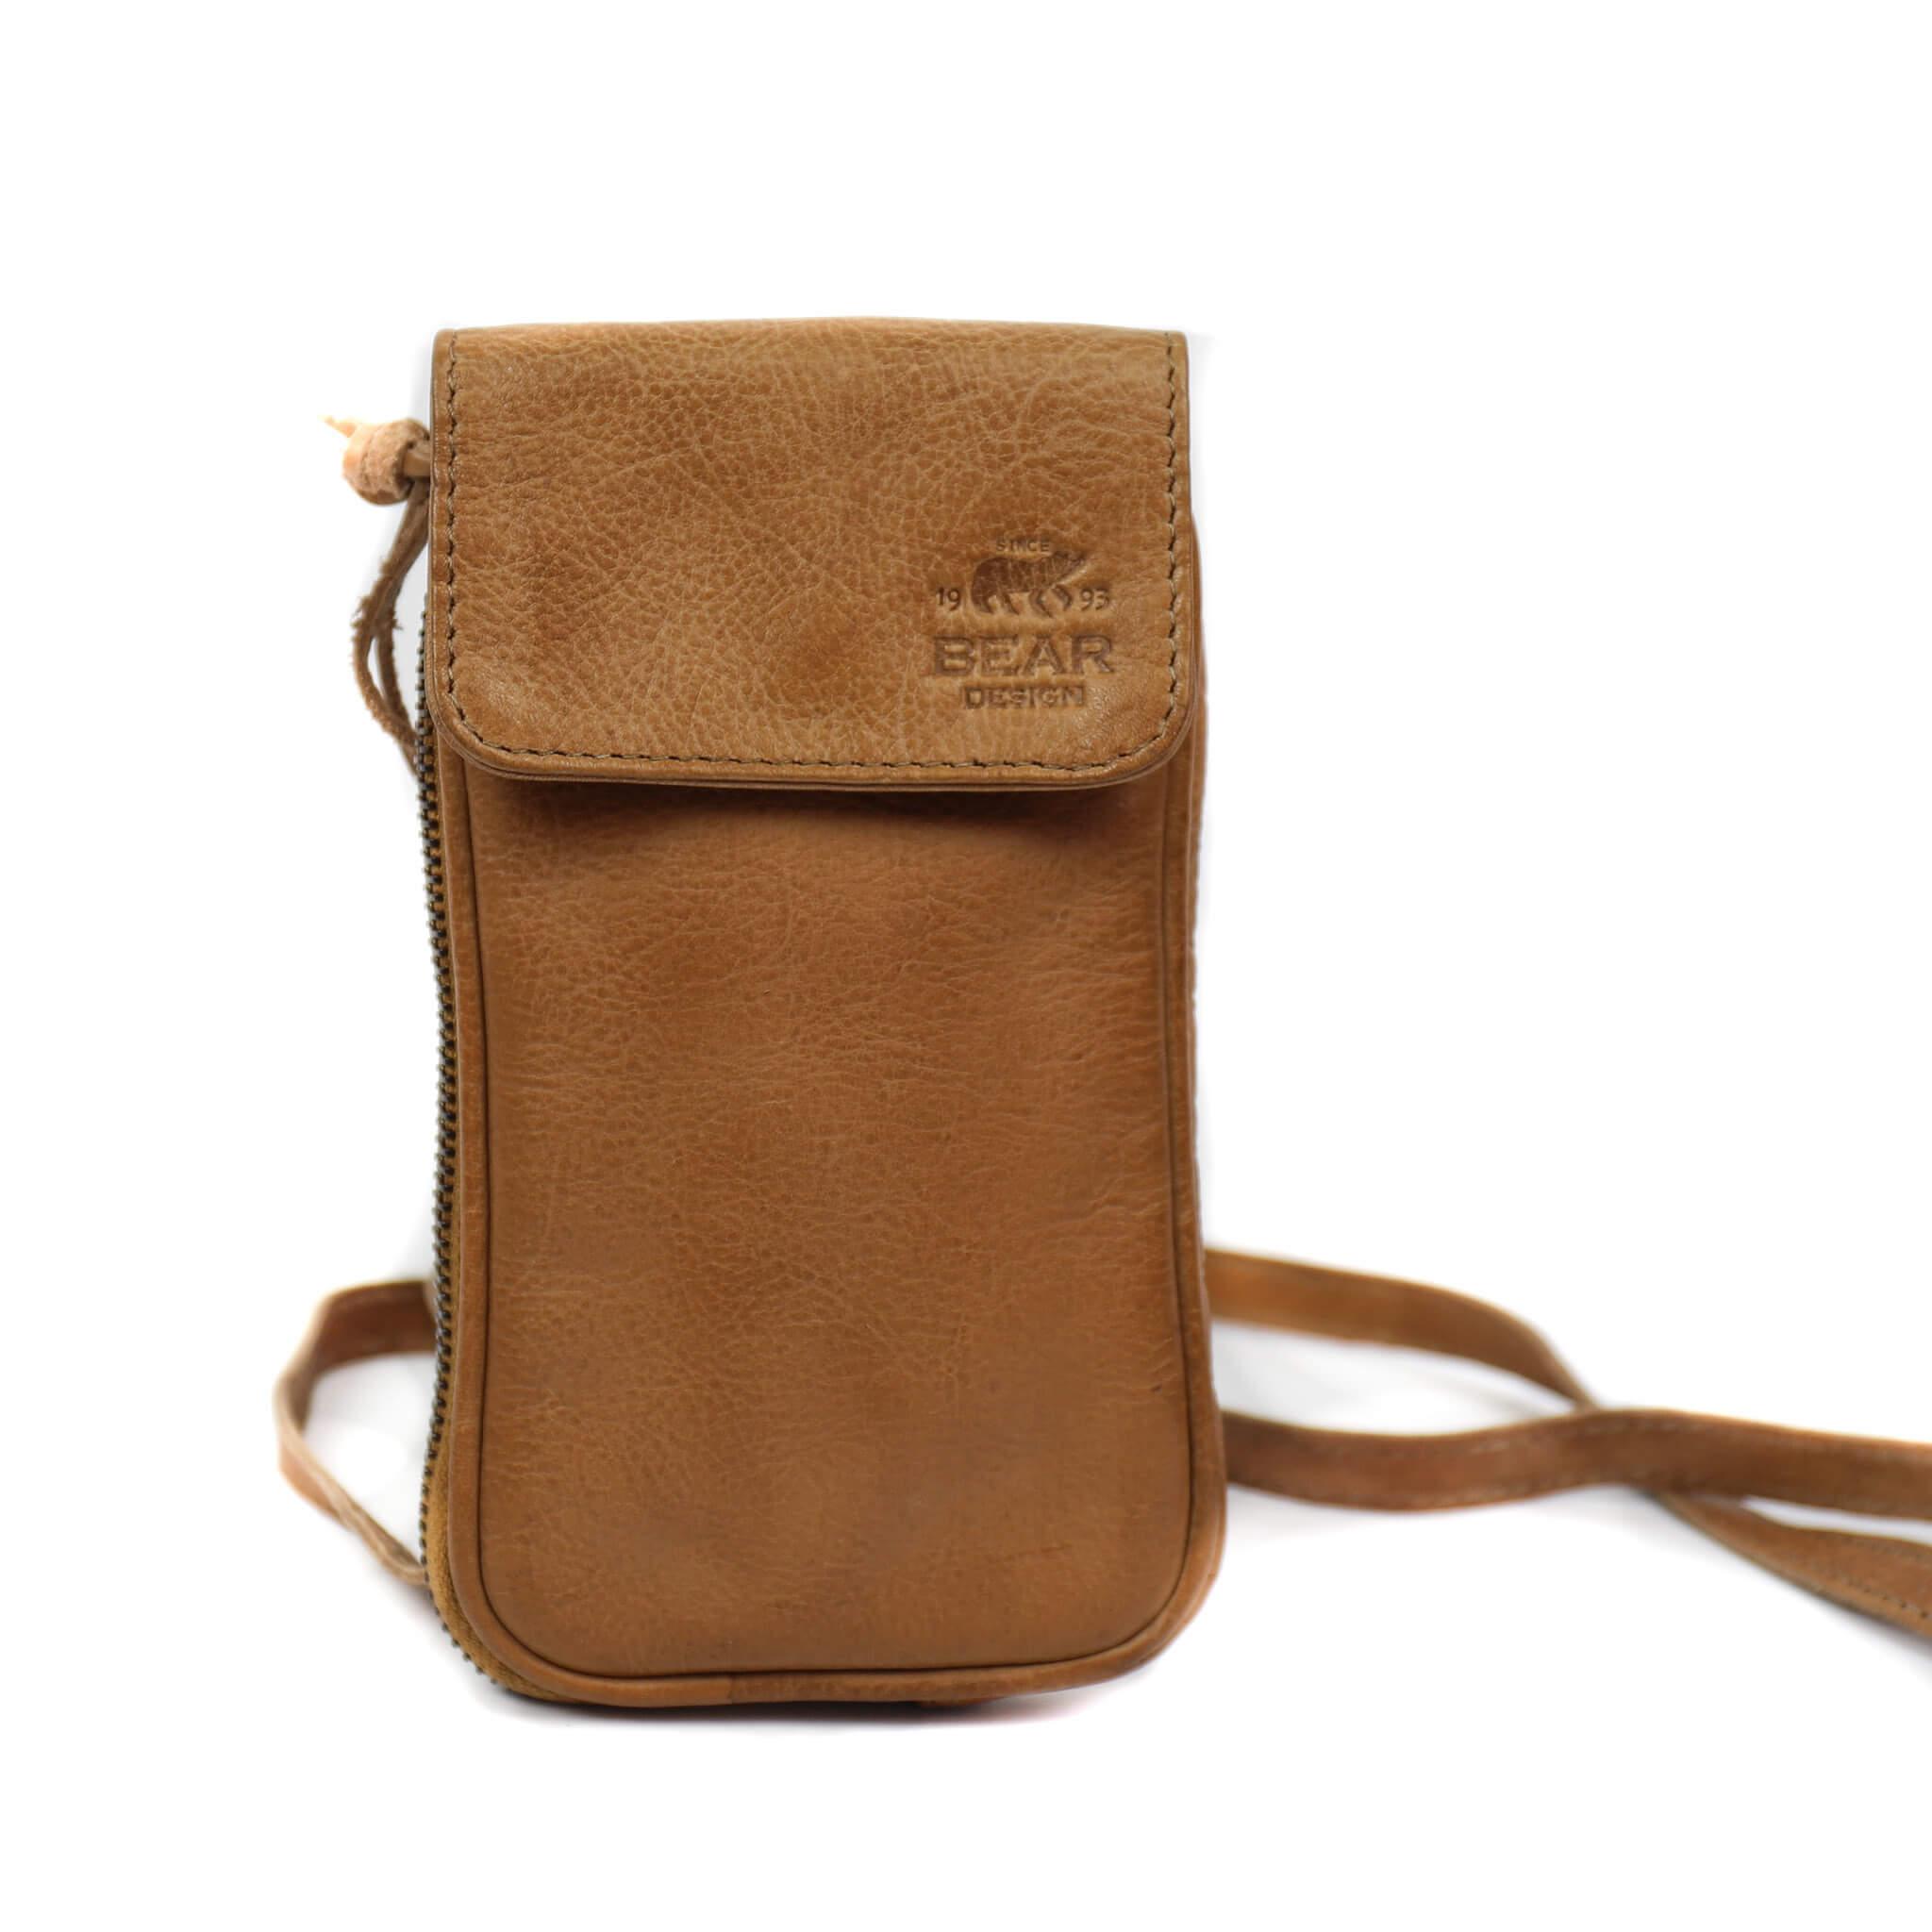 Bear Design Phone Bag Ahana Telefoontasje Taupe